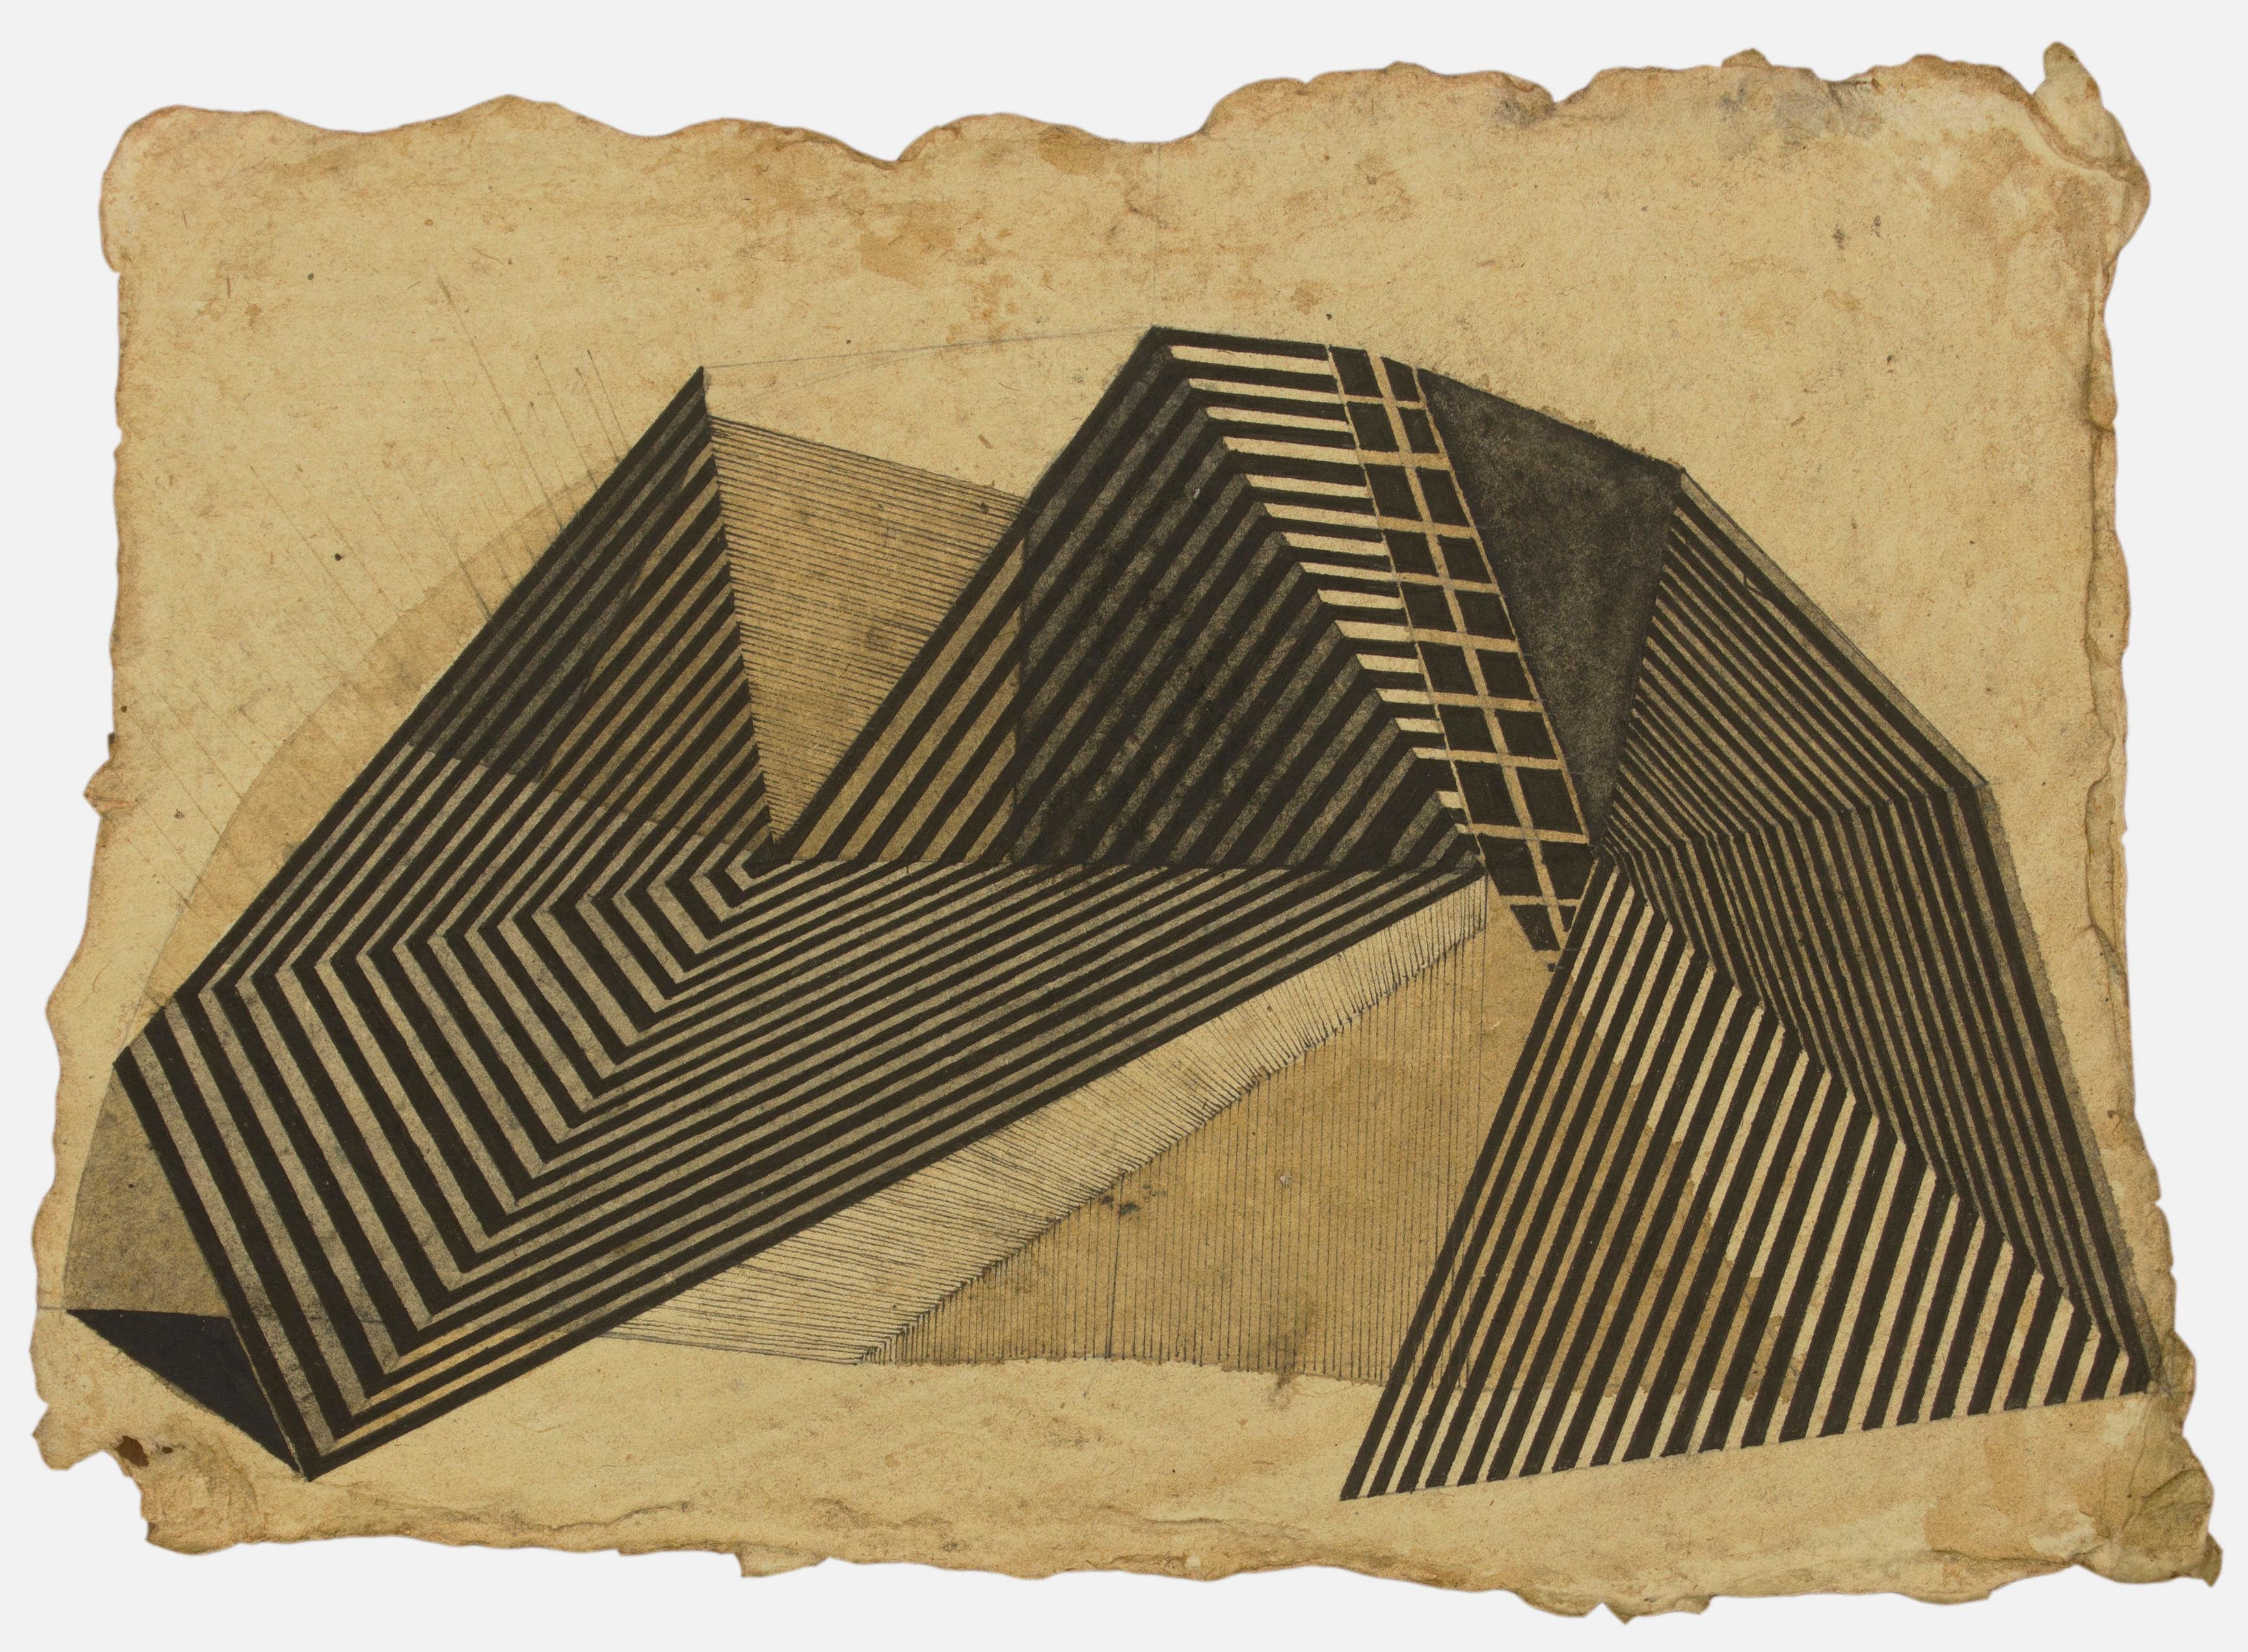 2b-bhagyashree-suthar-untitled-pen-ink-on-rajasthani-paper-9-x-6-5-in